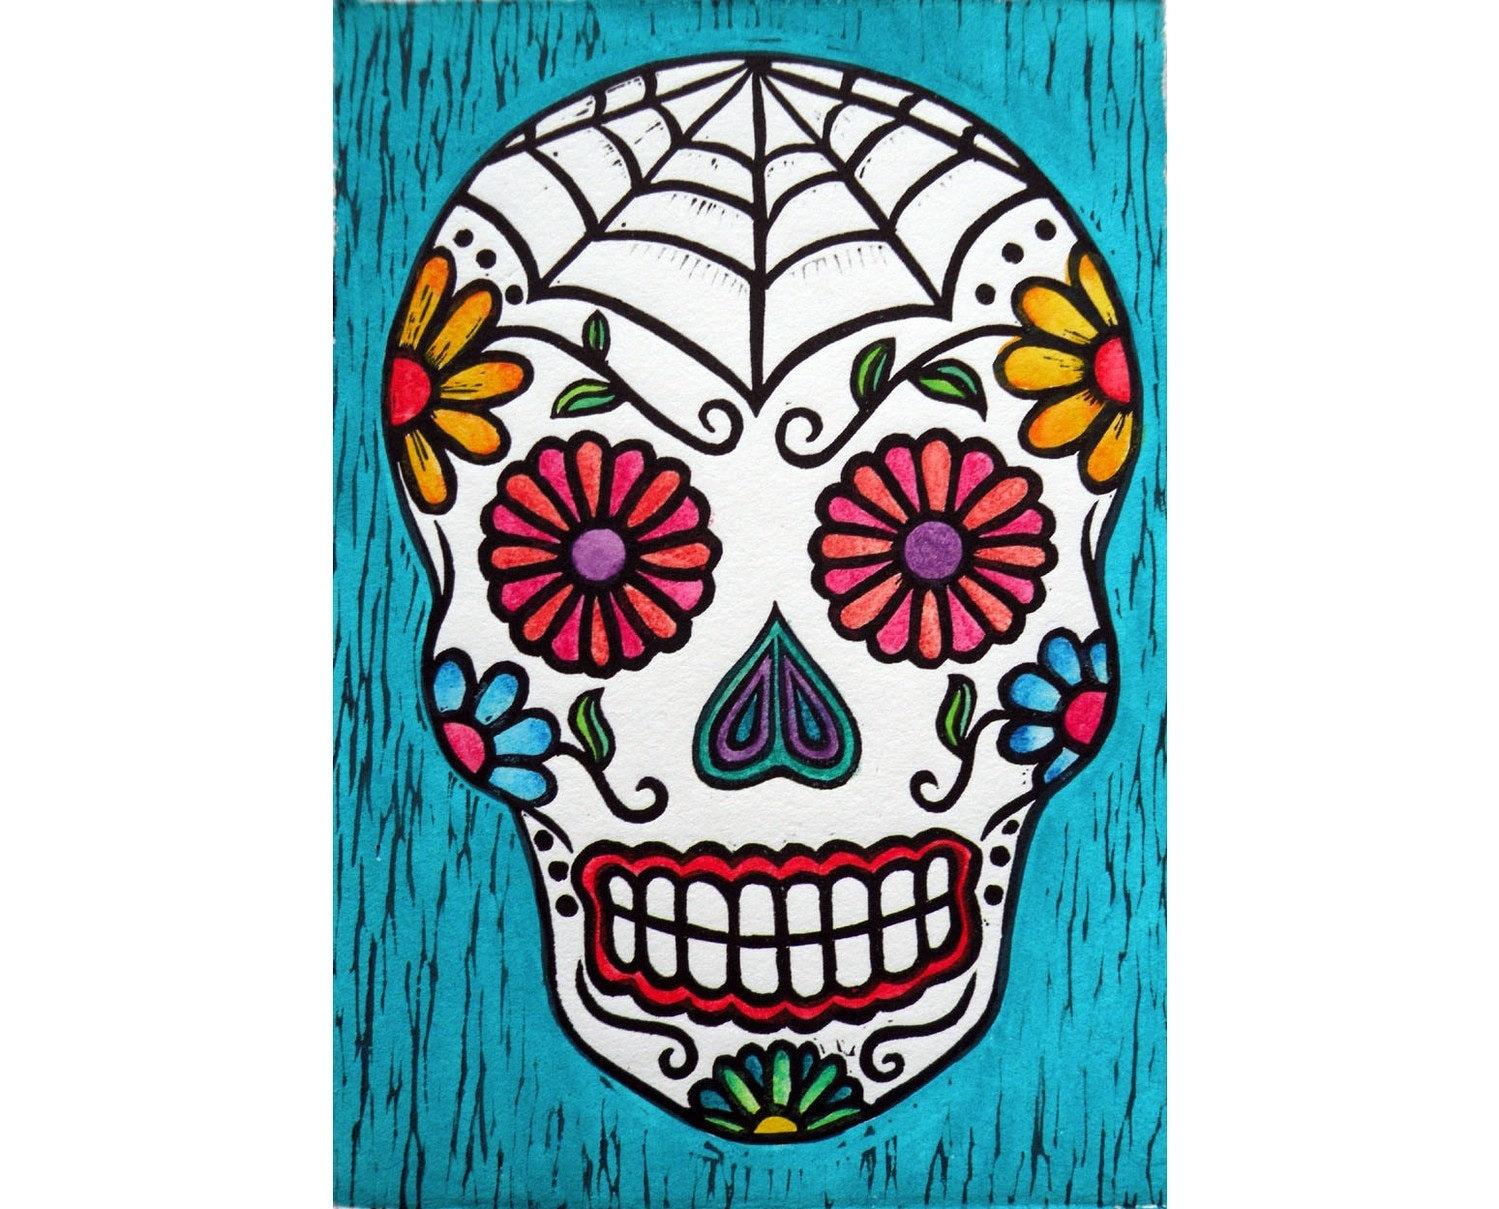 Sugar Skull (hand-colored linocut)